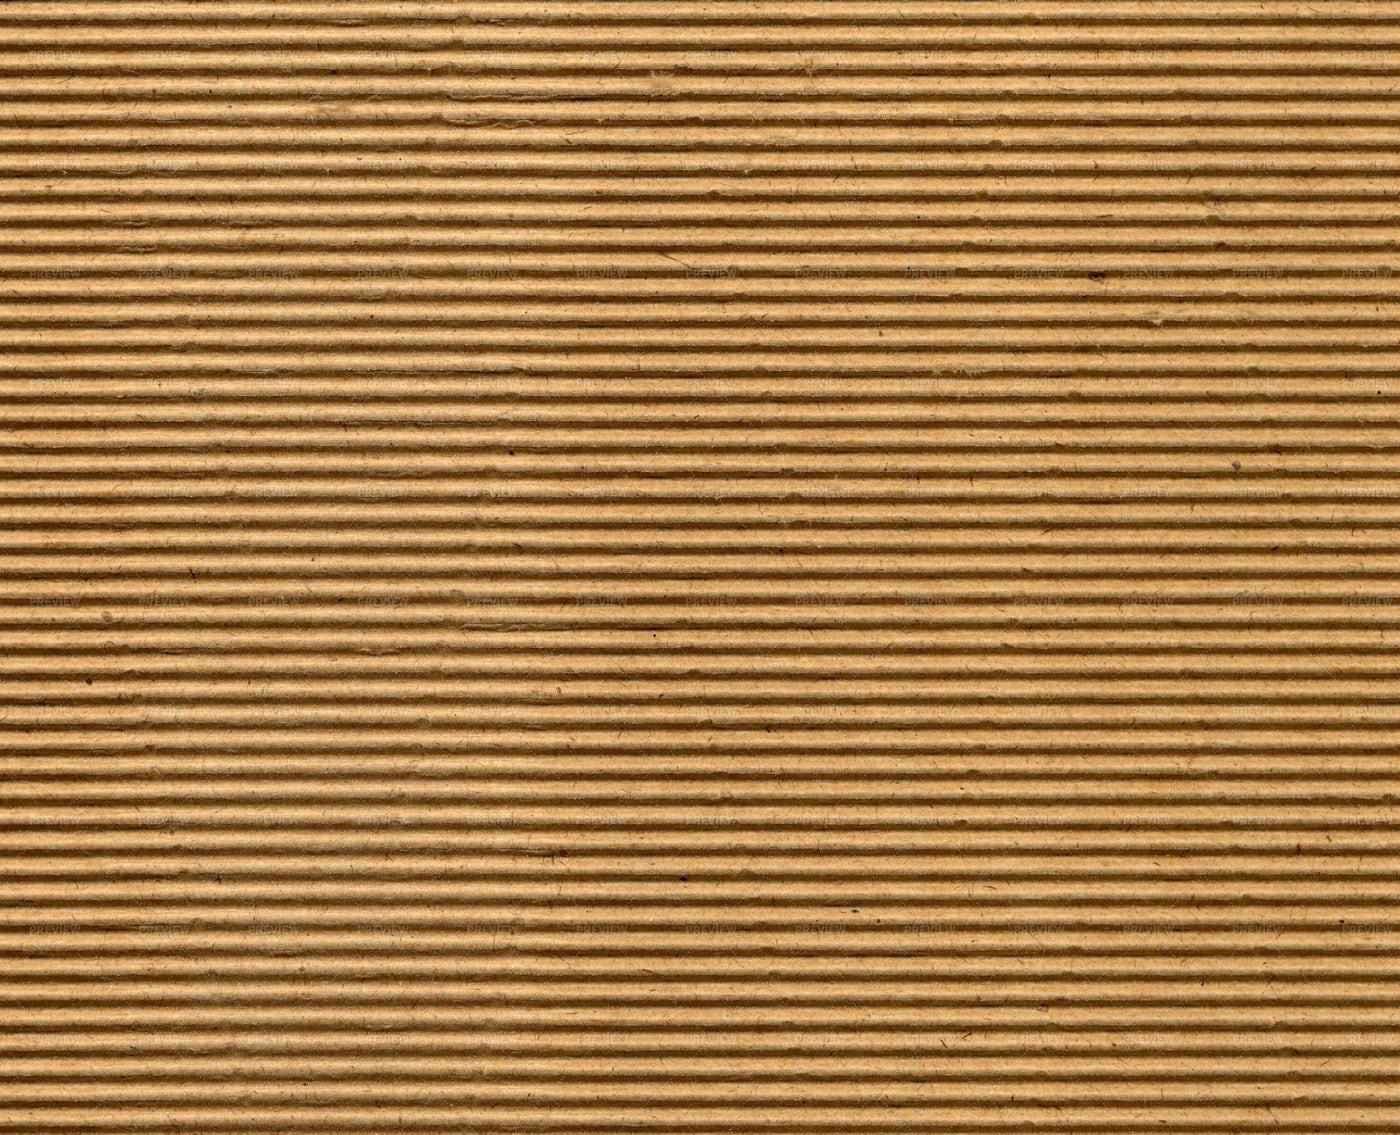 Brown Corrugated Cardboard Texture: Stock Photos